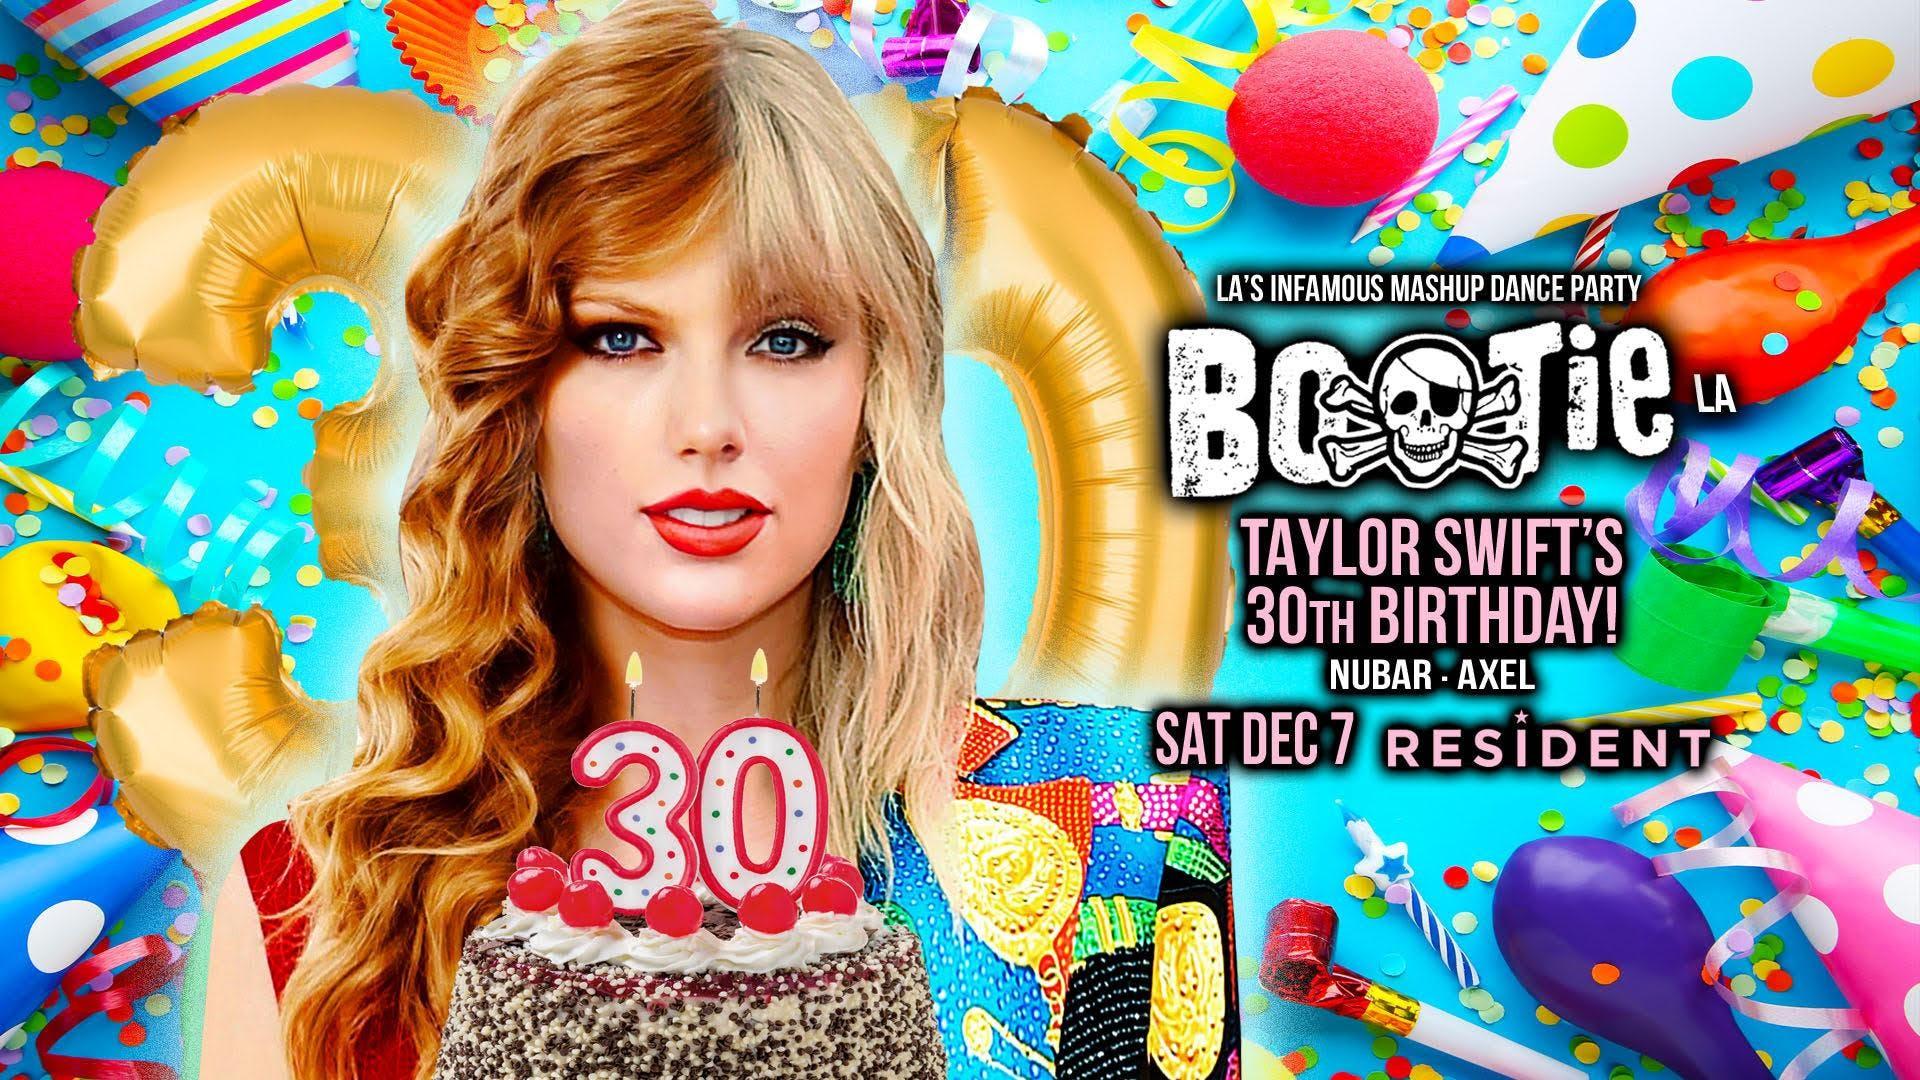 BOOTIE LA: Taylor Swift's 30th Birthday!